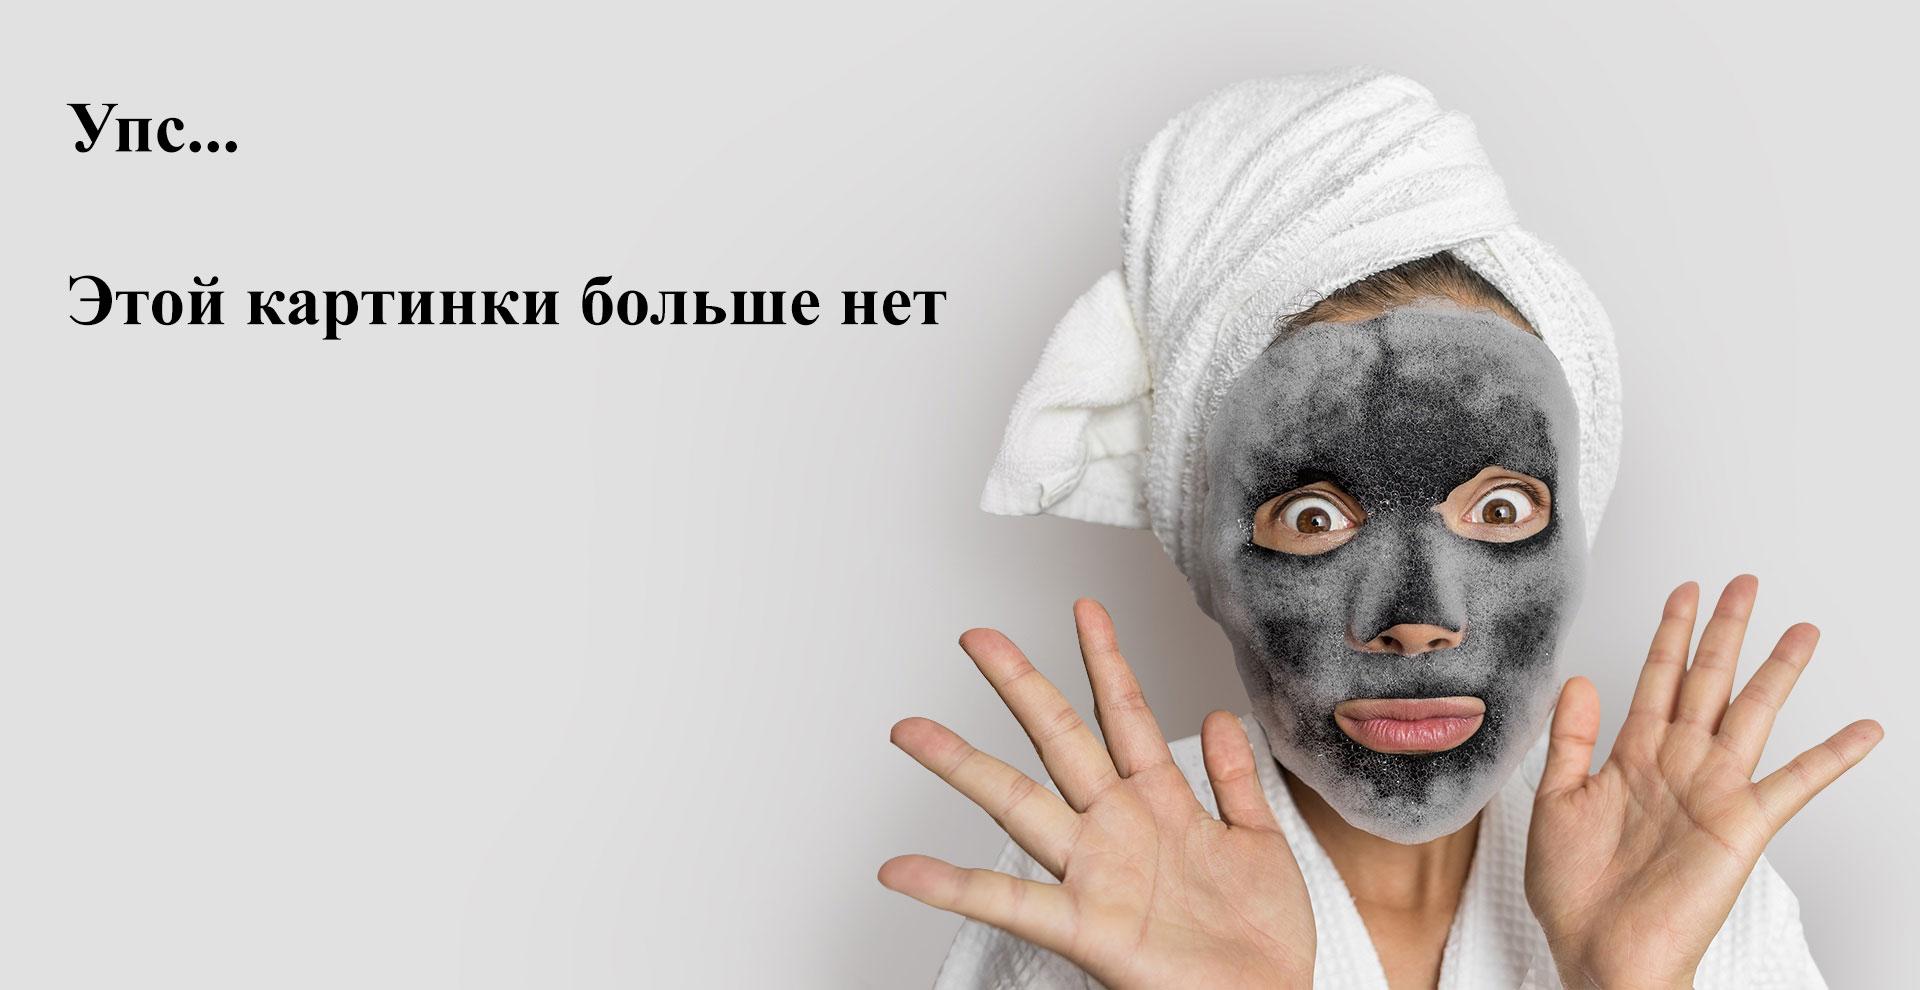 Patrisa Nail, Гель-лак Party Night Flash Magnetic, 8 мл